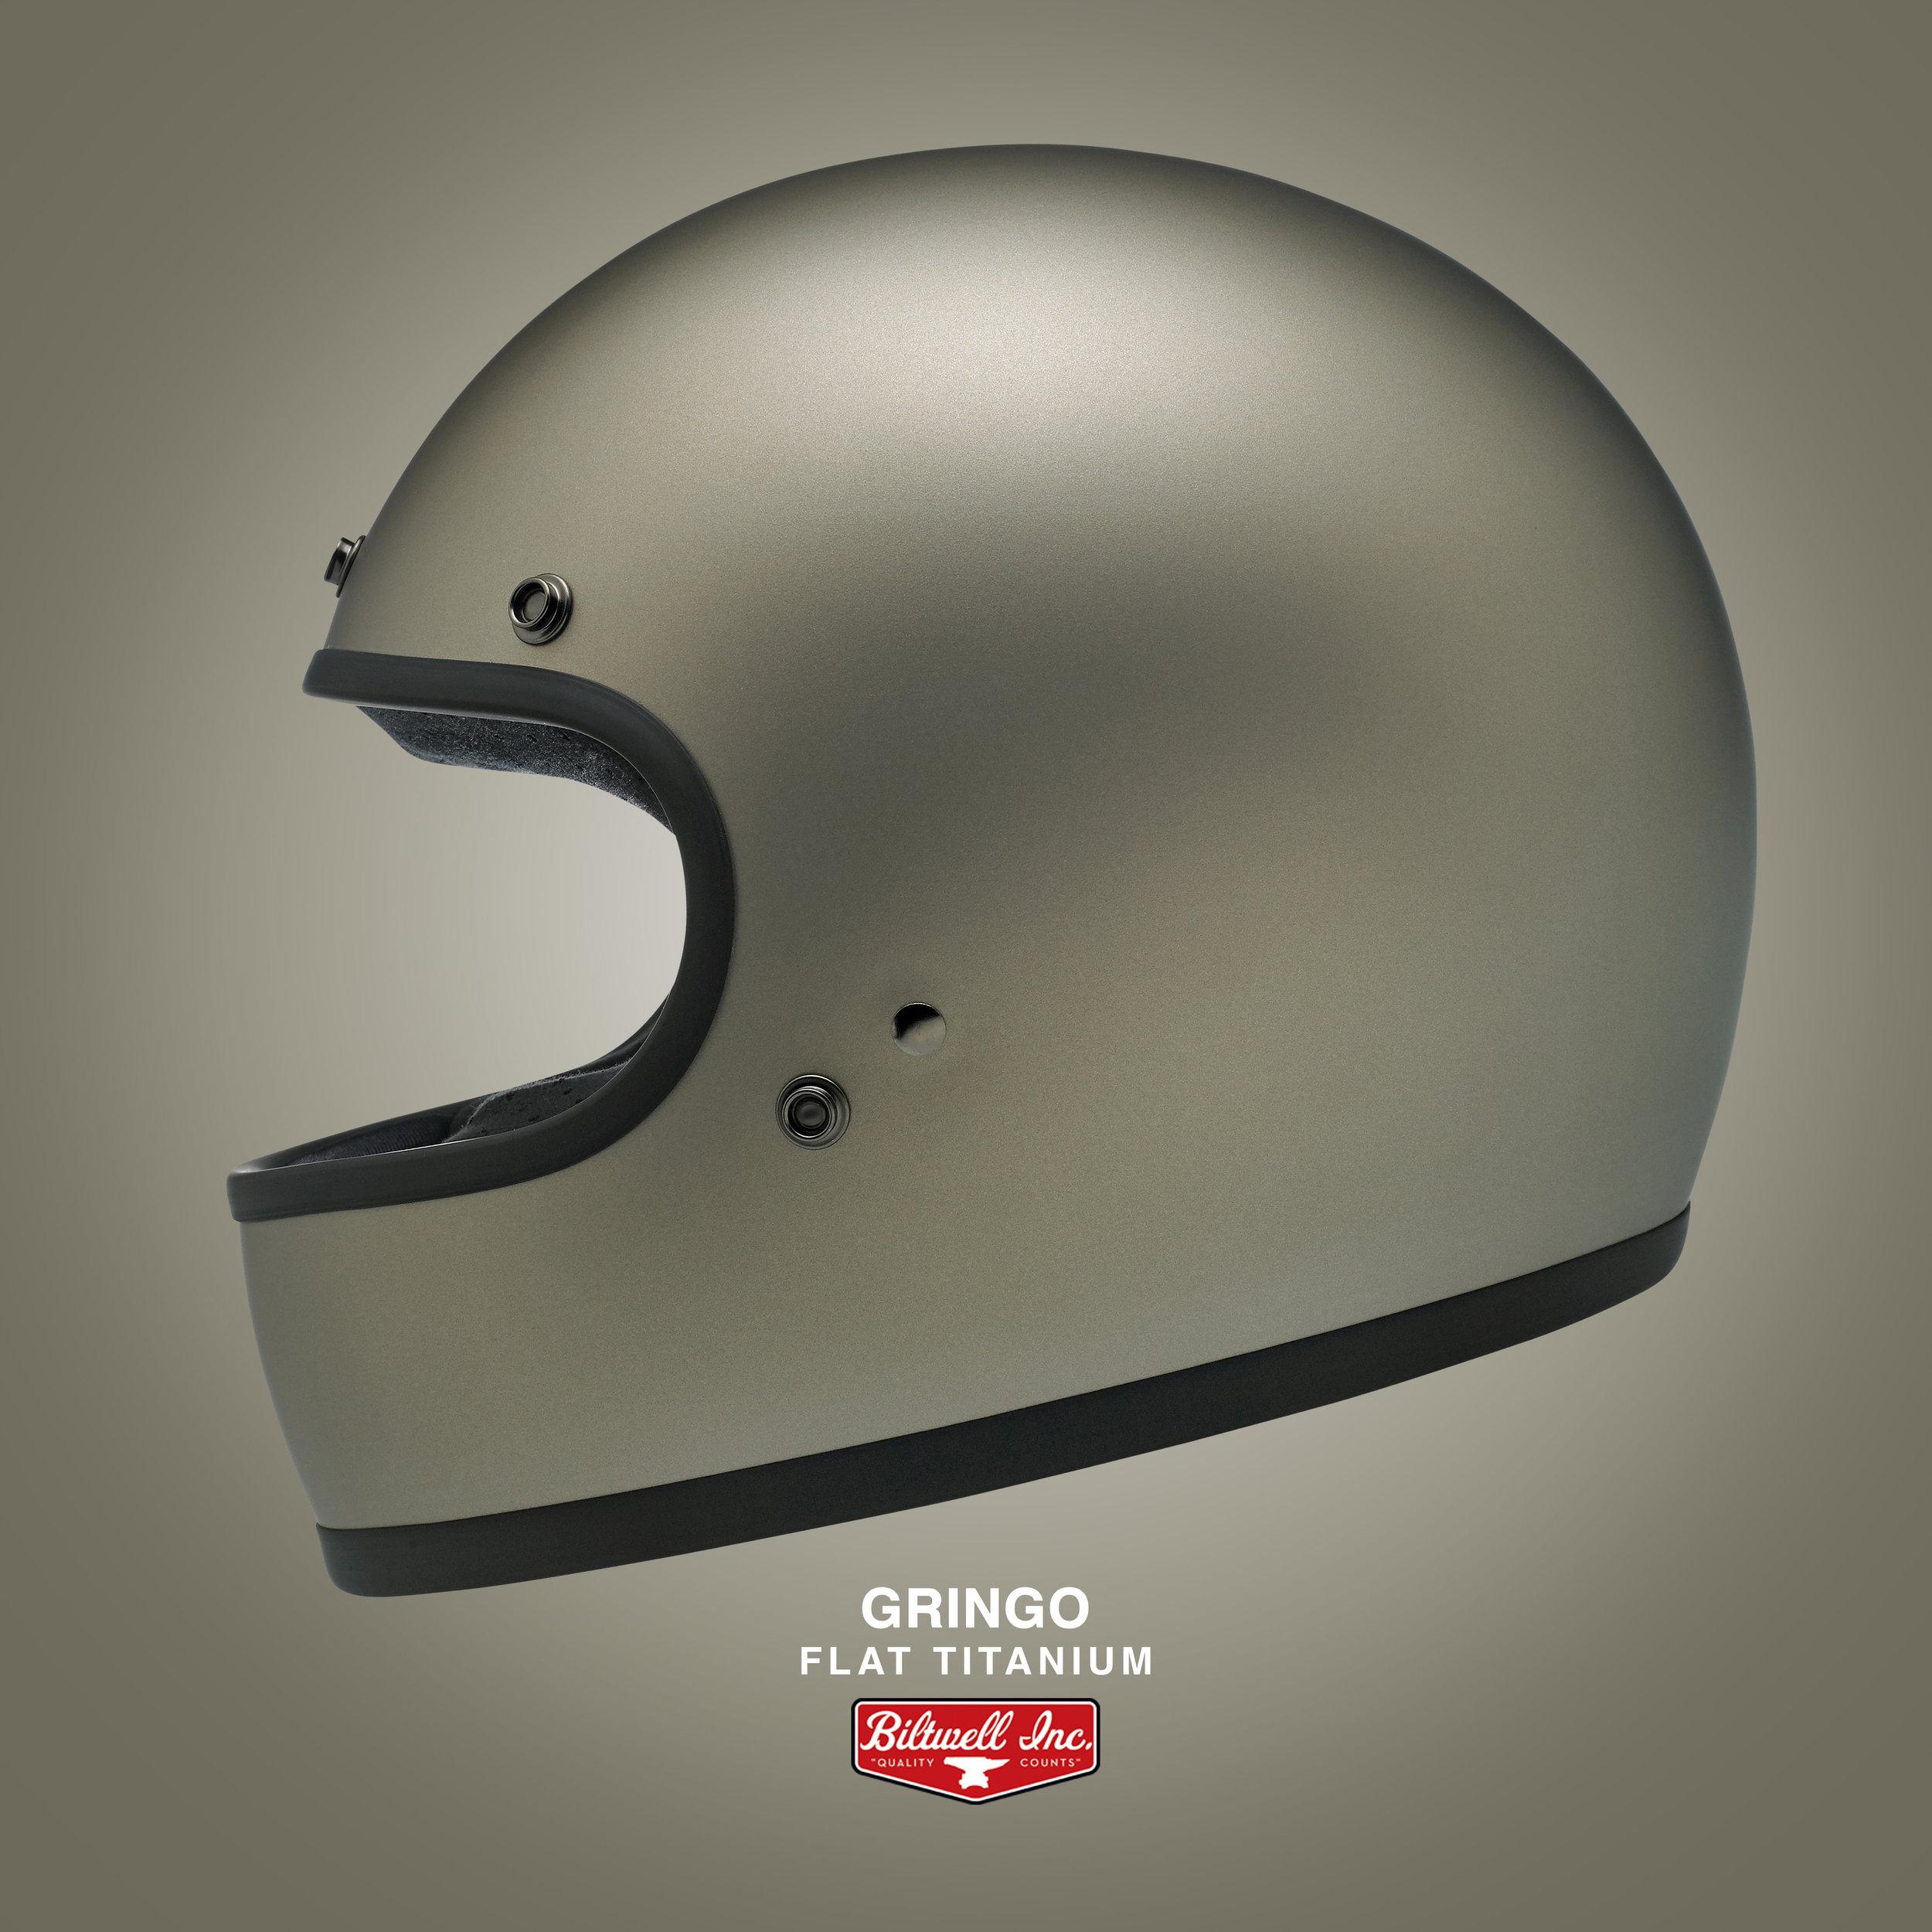 1002-203_Flat Ti Gringo Helmet Panel.jpg